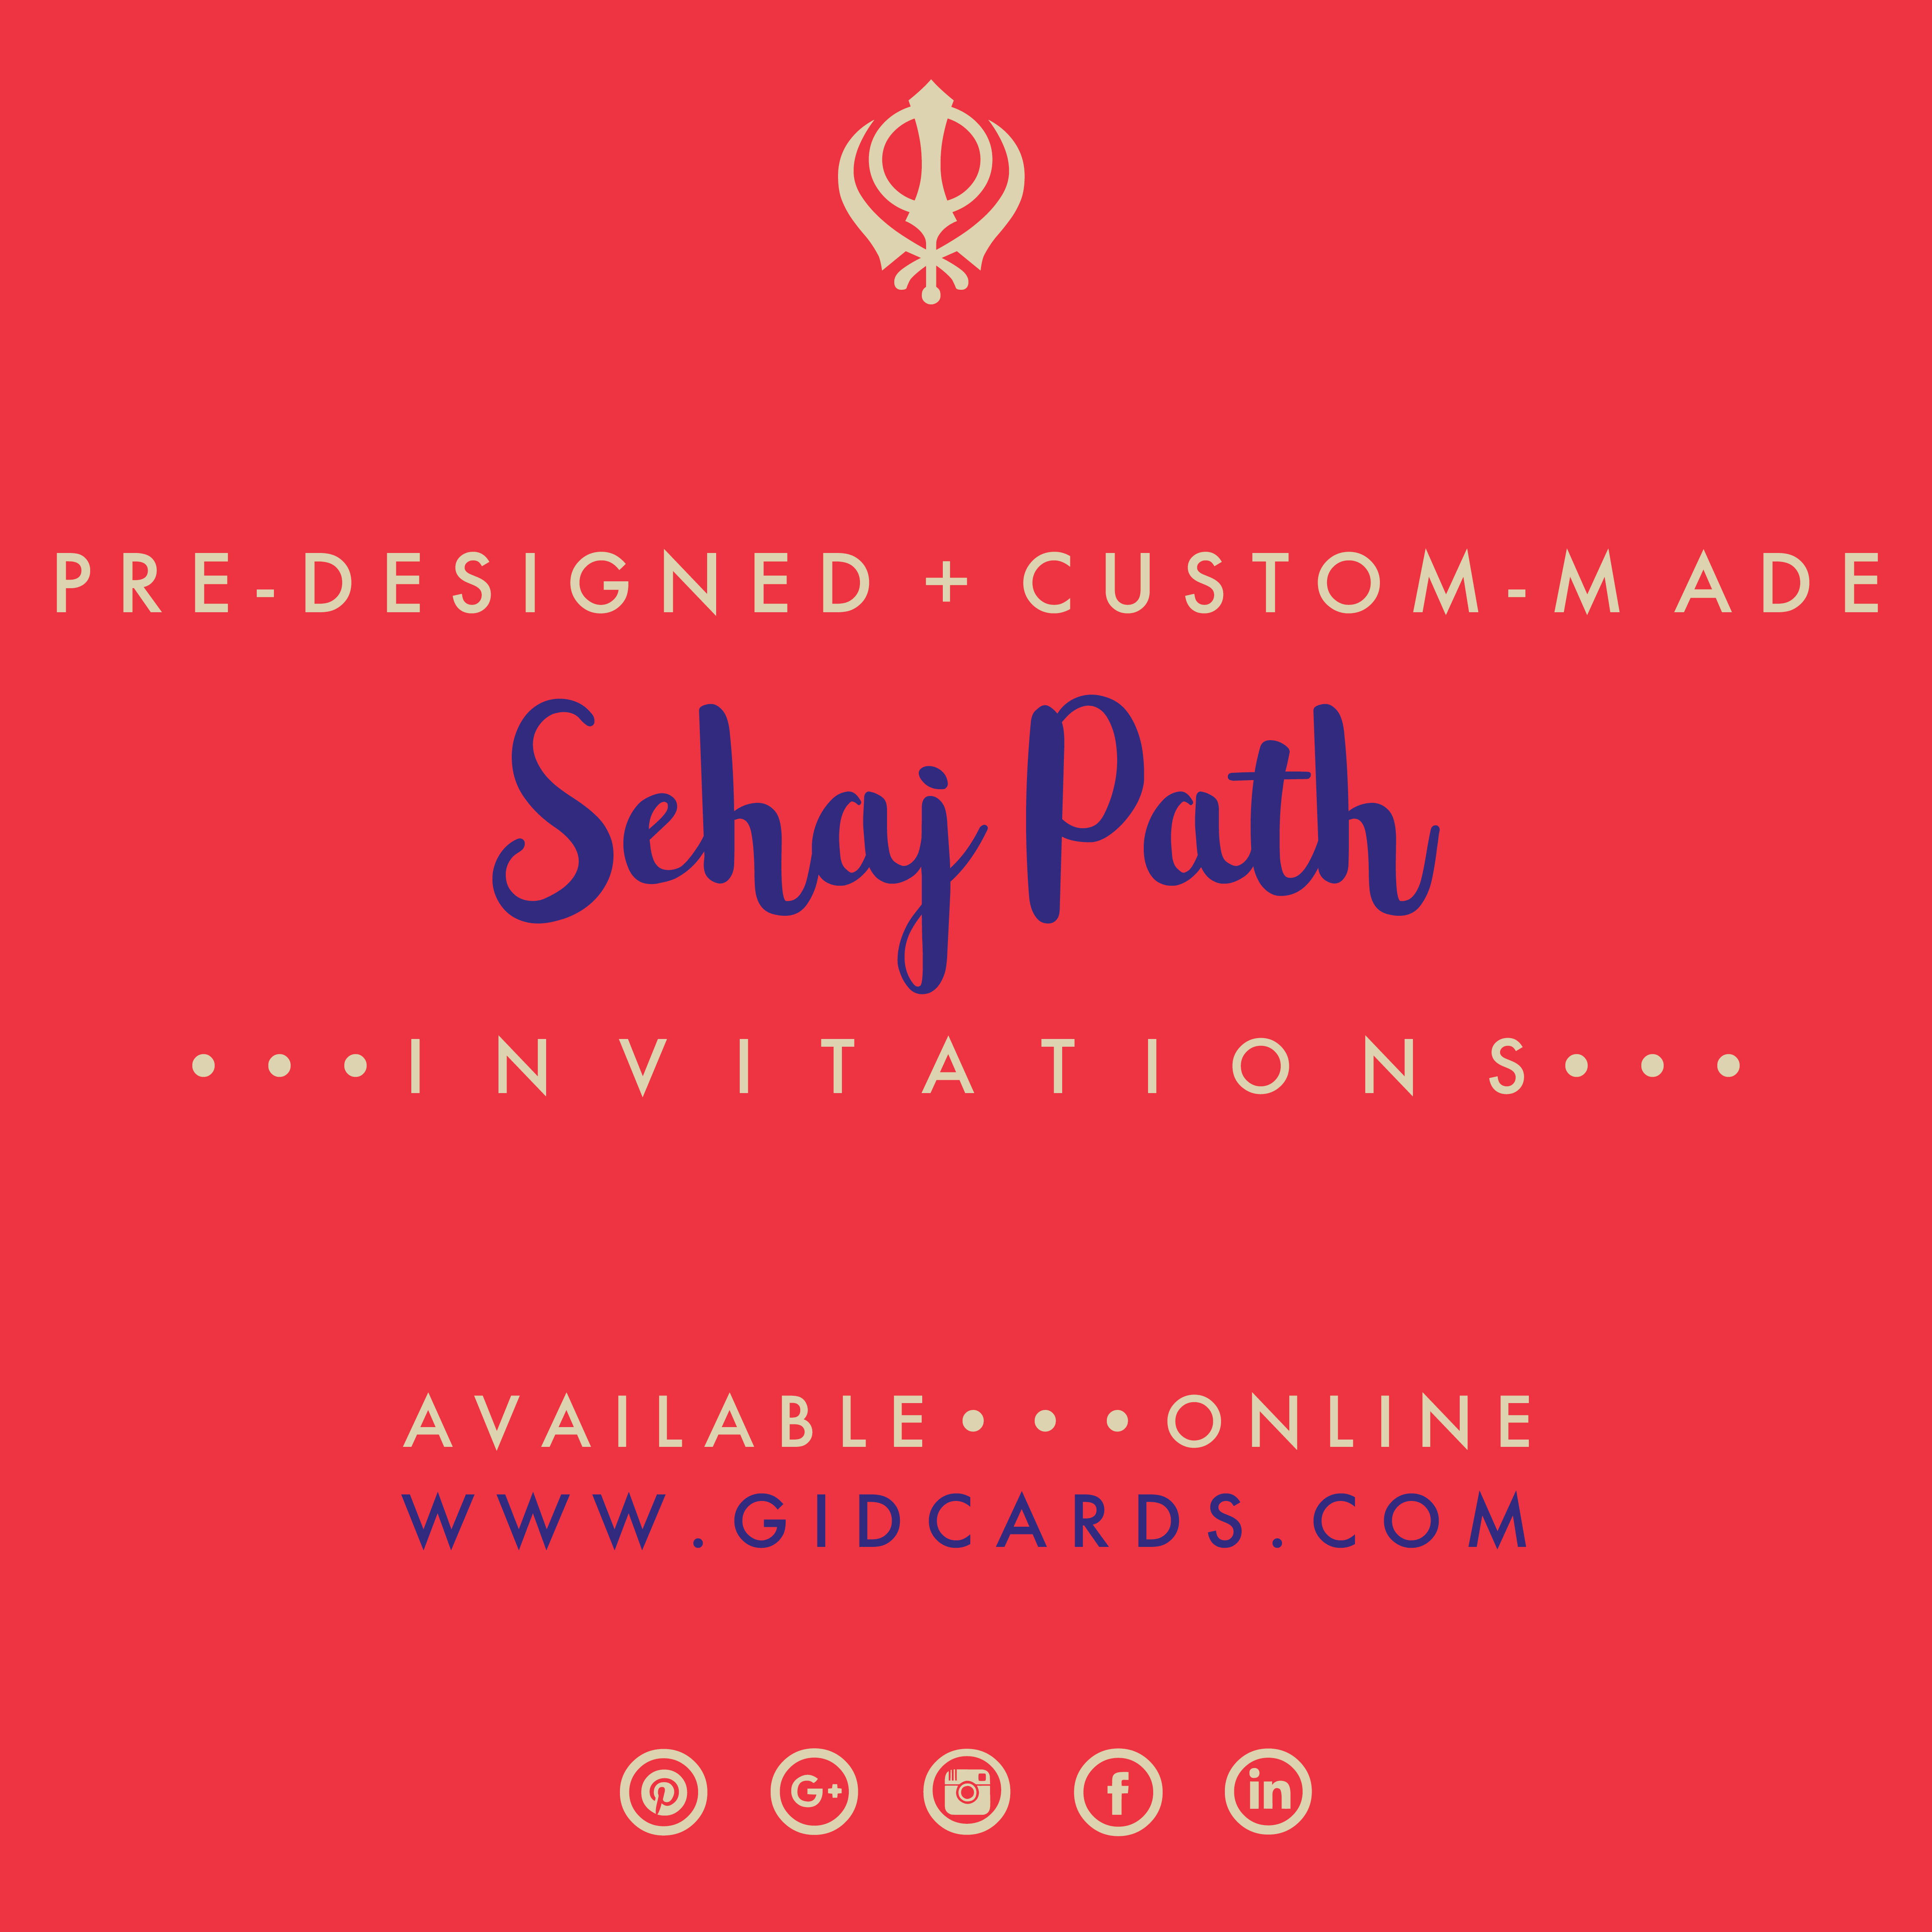 Pin By Rupymangat On Sukhmani Sahib Path Stationery Design My Design Stationery